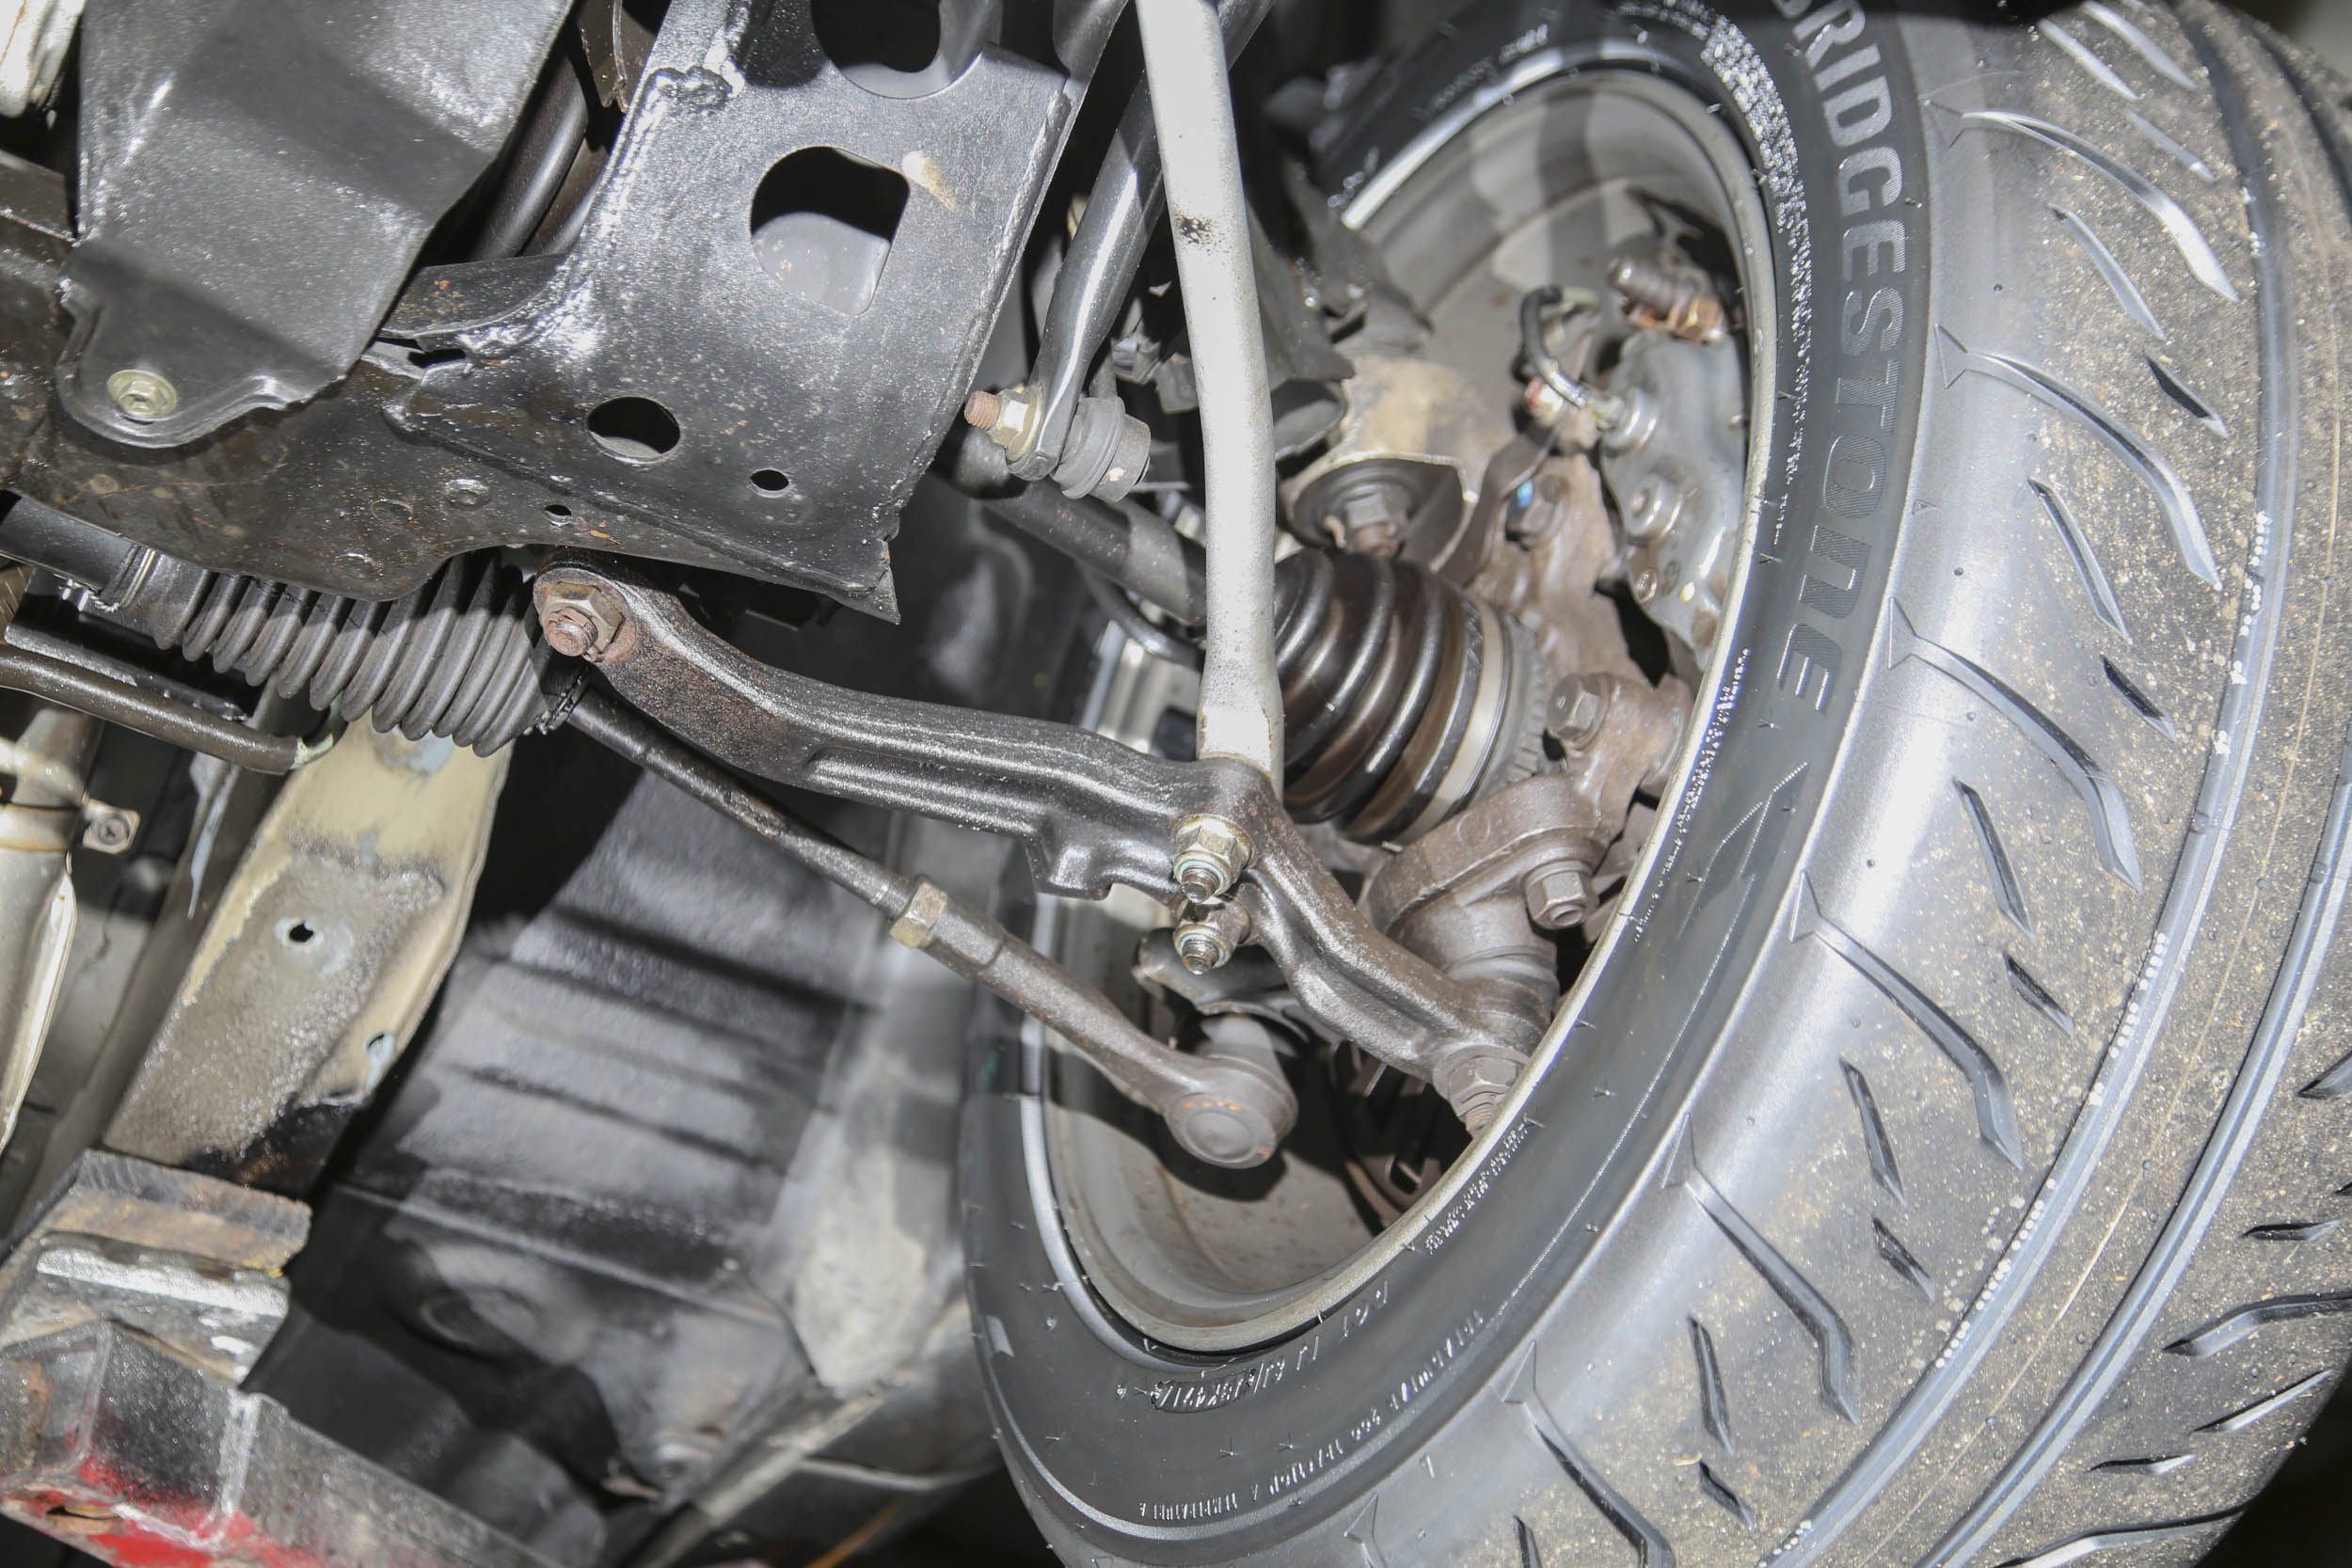 Nissan R32 GT-R Front Suspension